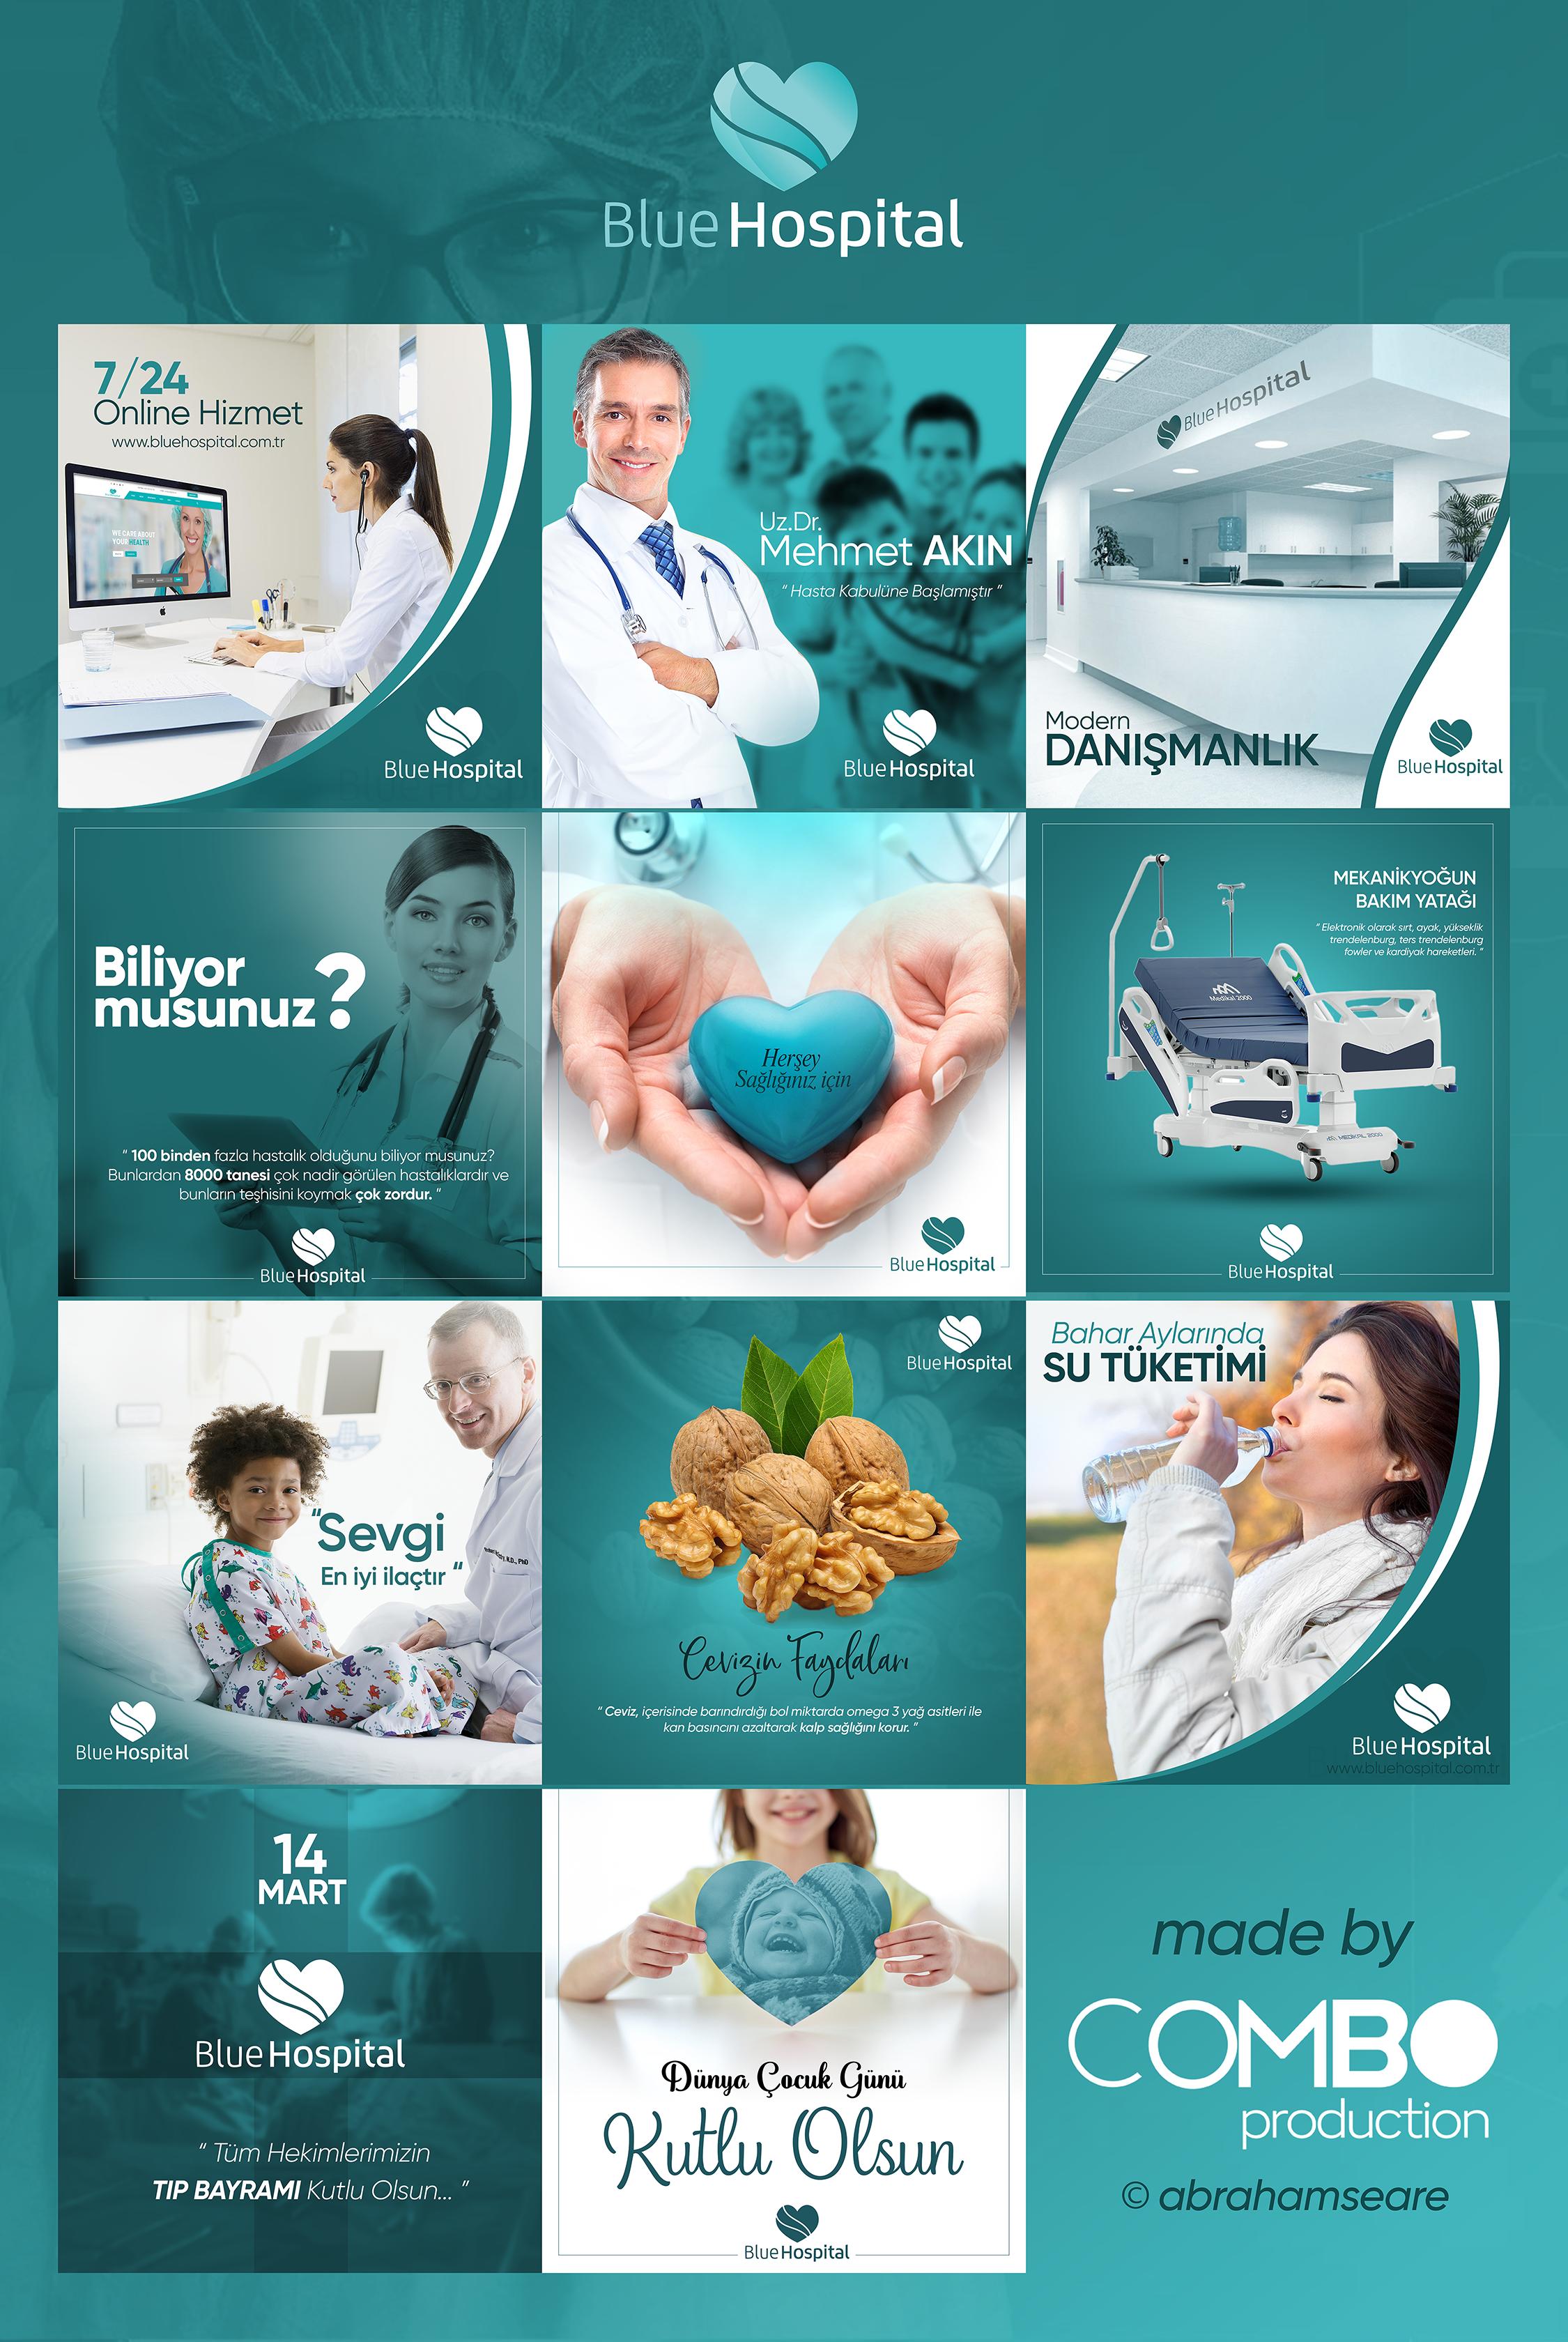 Medical Social Media Banner By Abraham Seare Abraham Banner Media M In 2020 Social Media Design Graphics Social Media Design Inspiration Social Media Banner